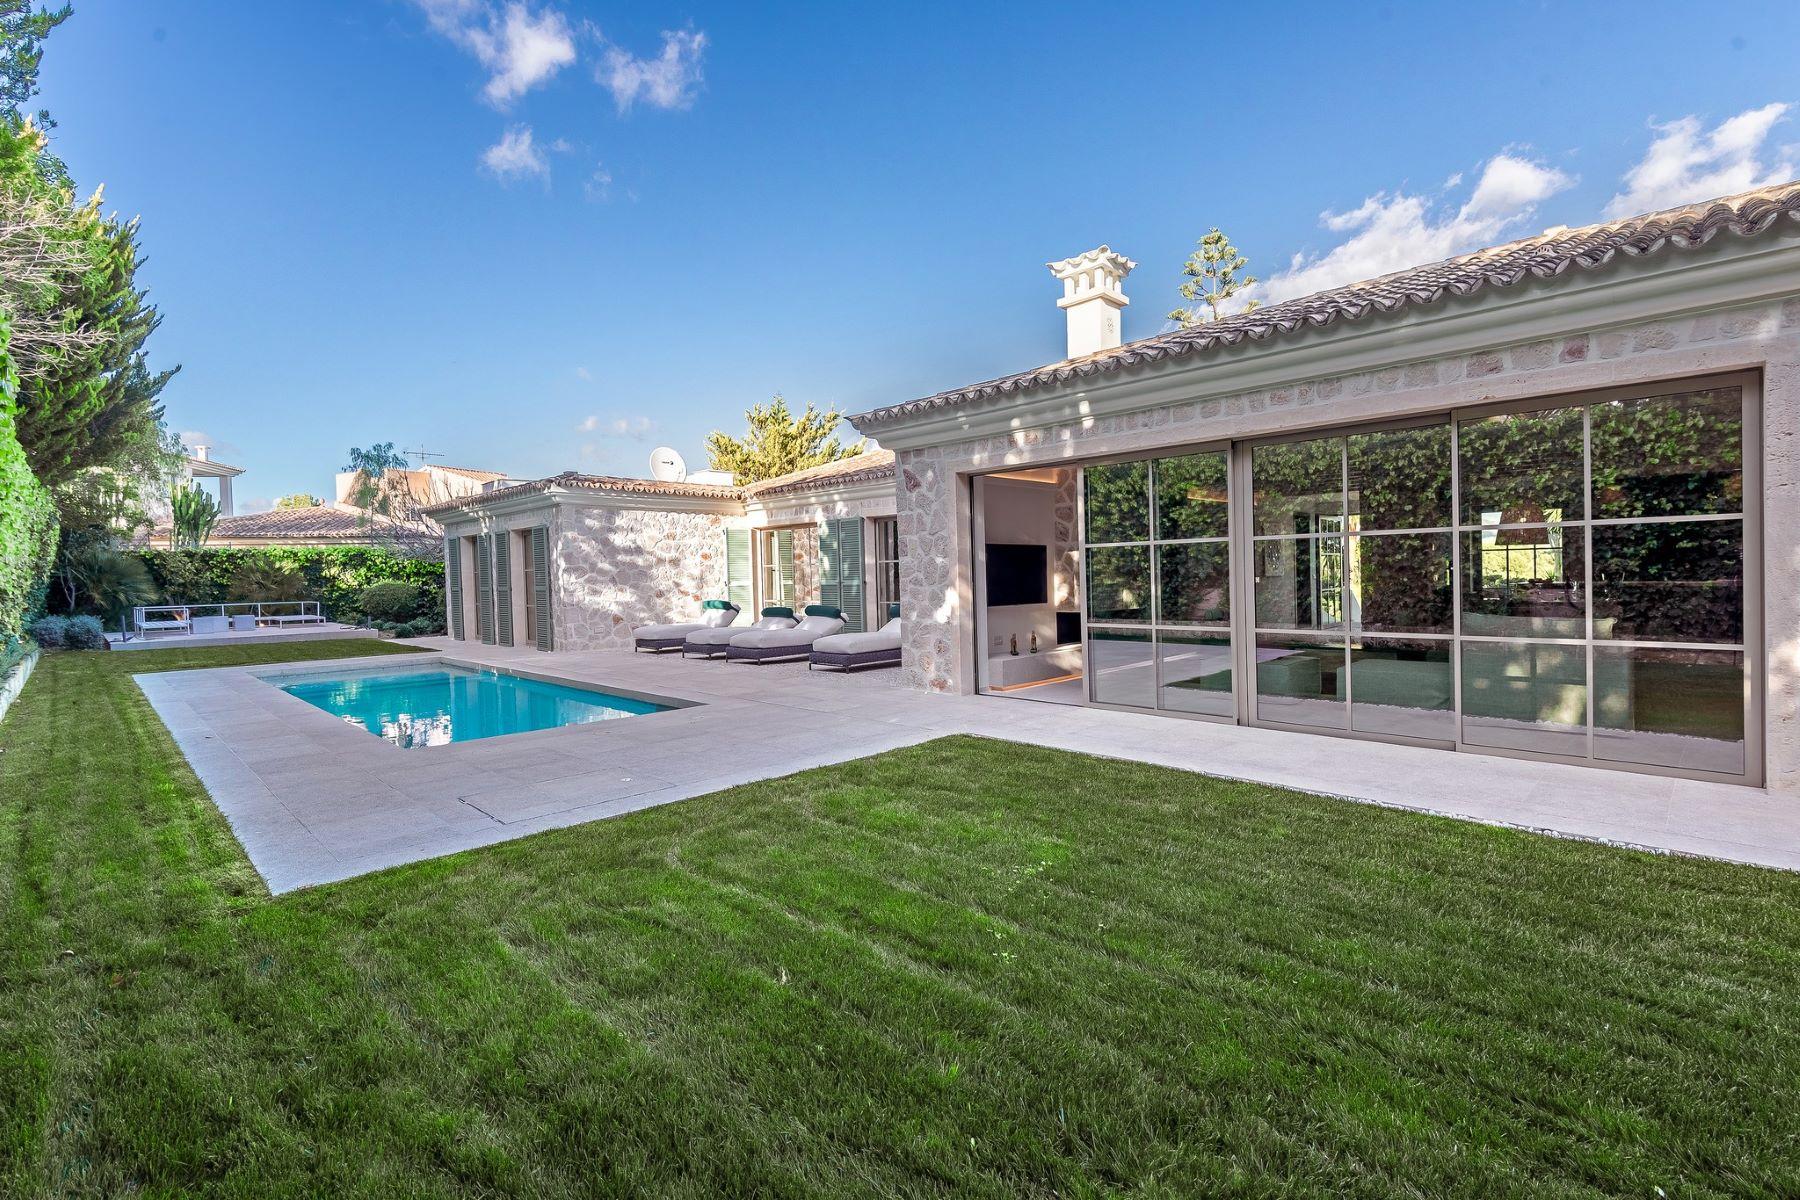 Single Family Home for Sale at Elegant property in Santa Ponsa Palma De Mallorca, Balearic Islands Spain